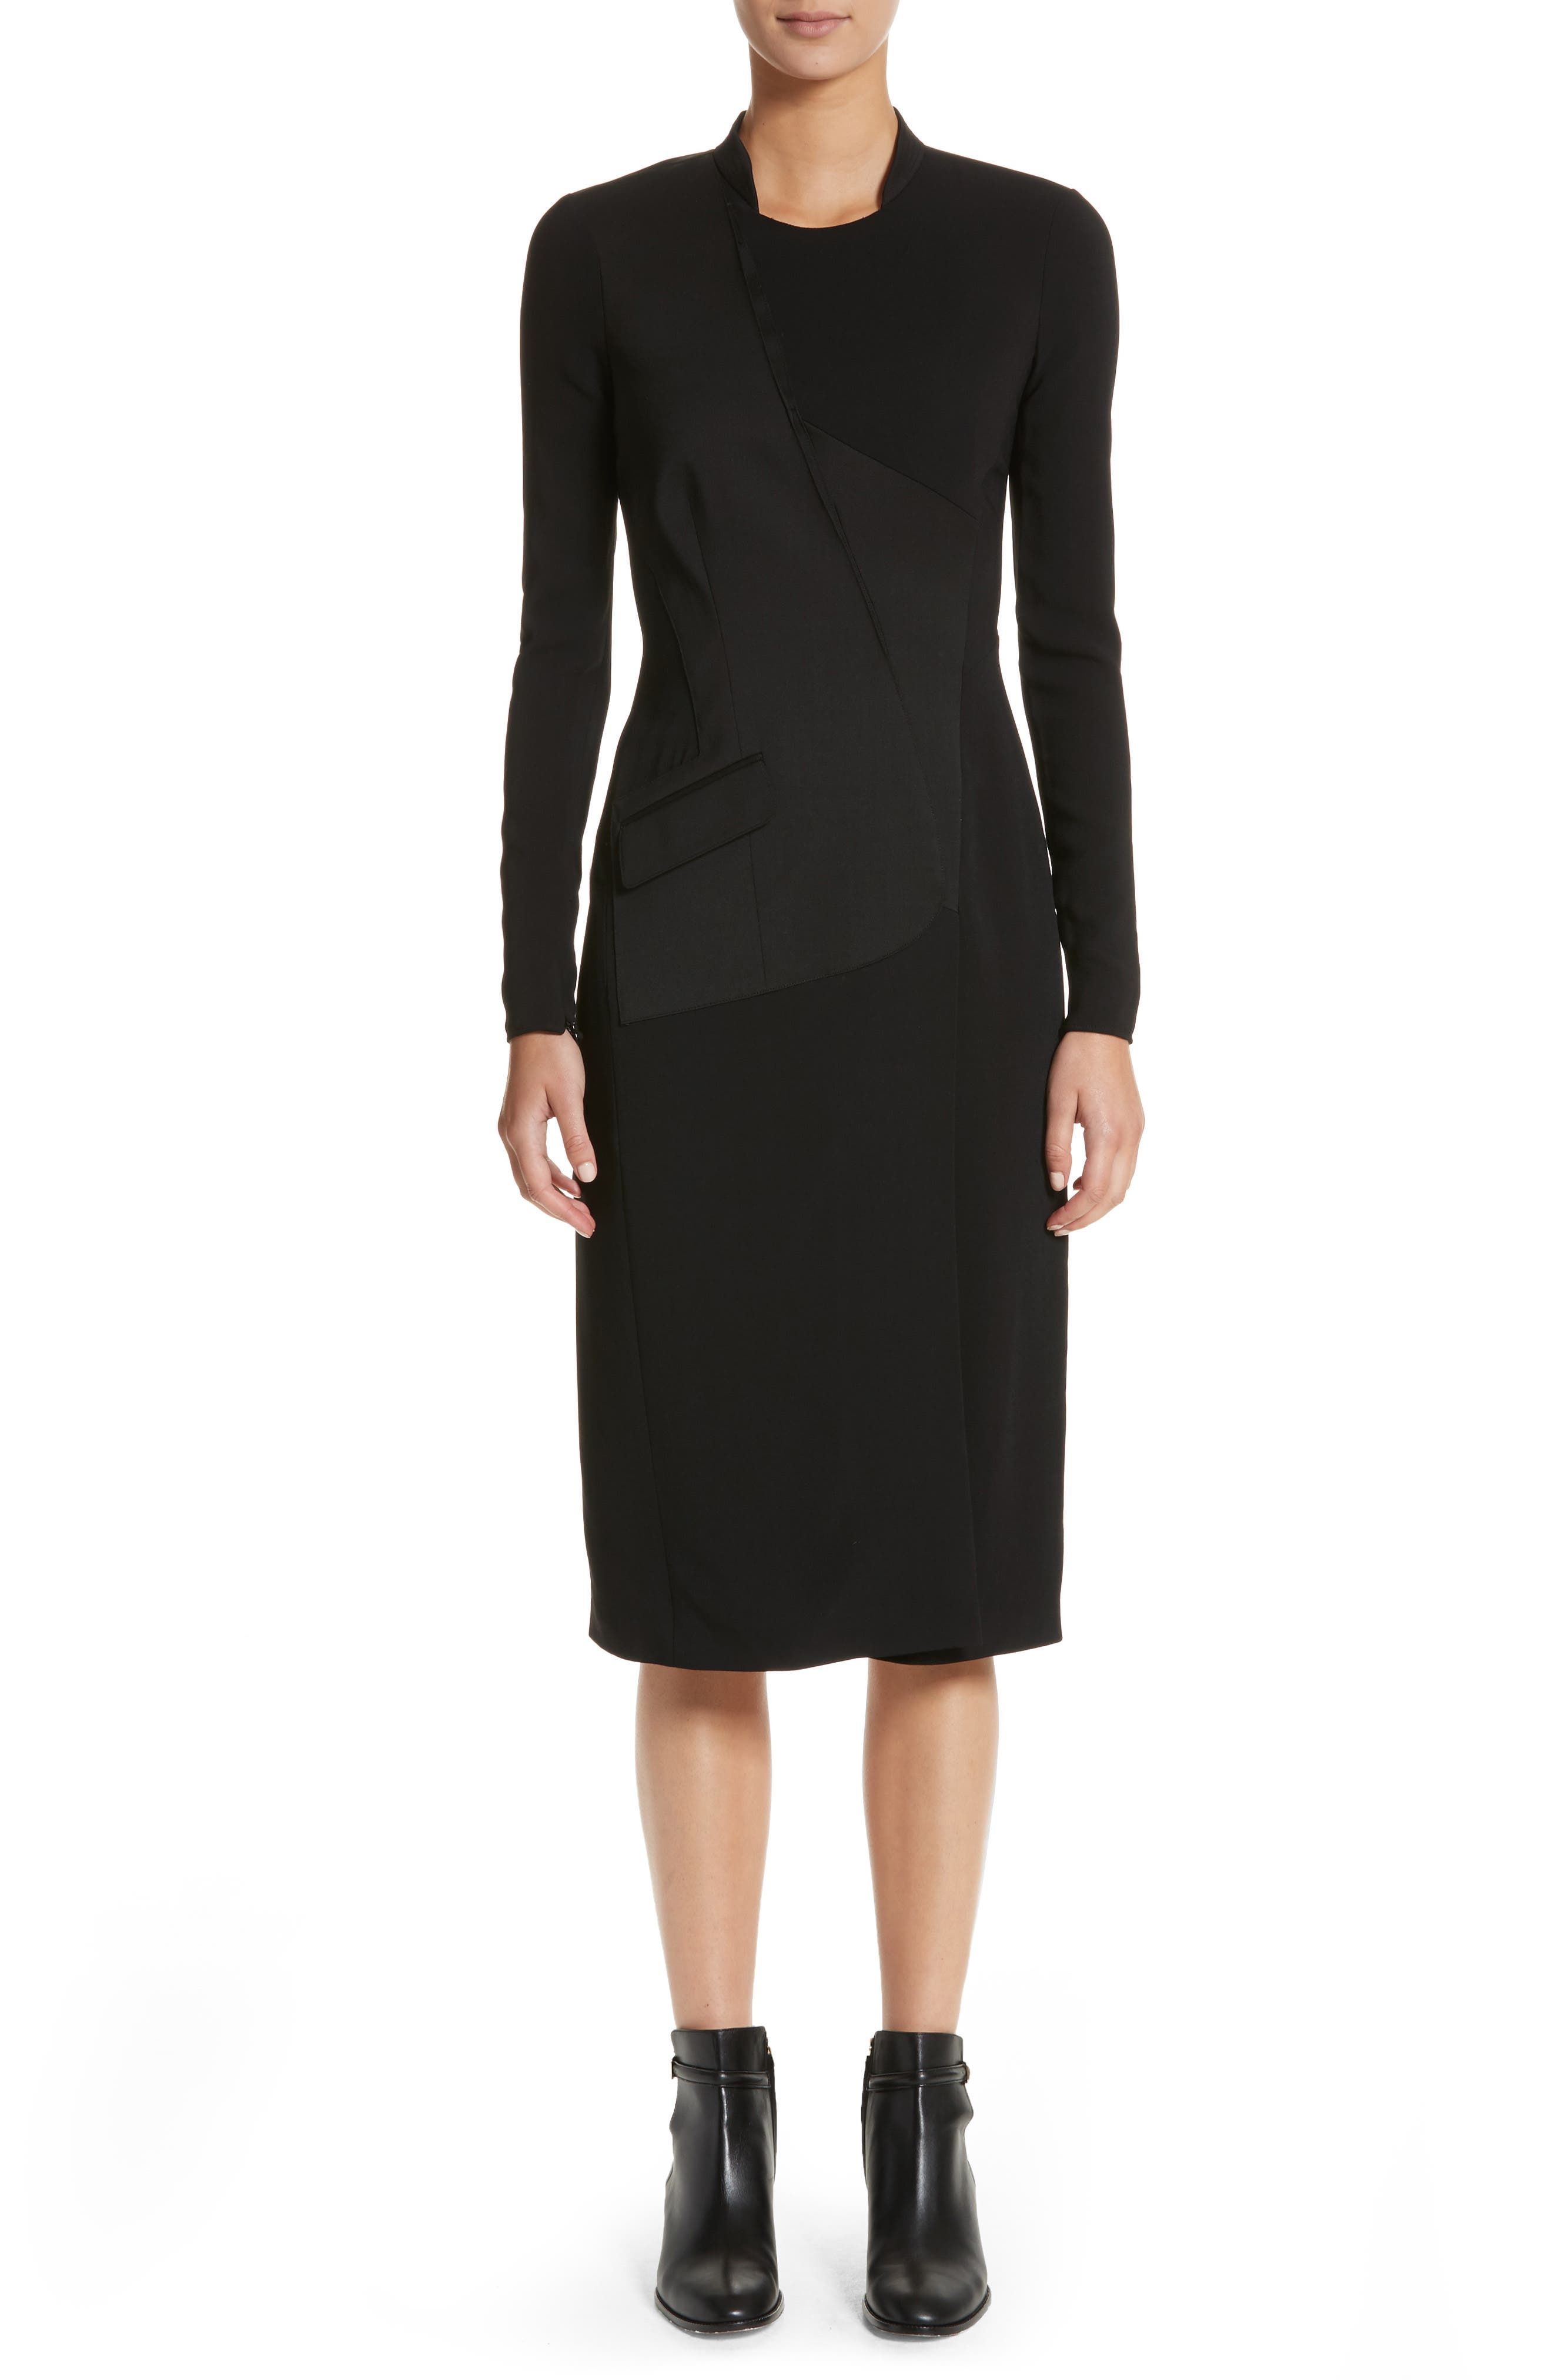 Miriam Sheath Dress,                             Main thumbnail 1, color,                             Black